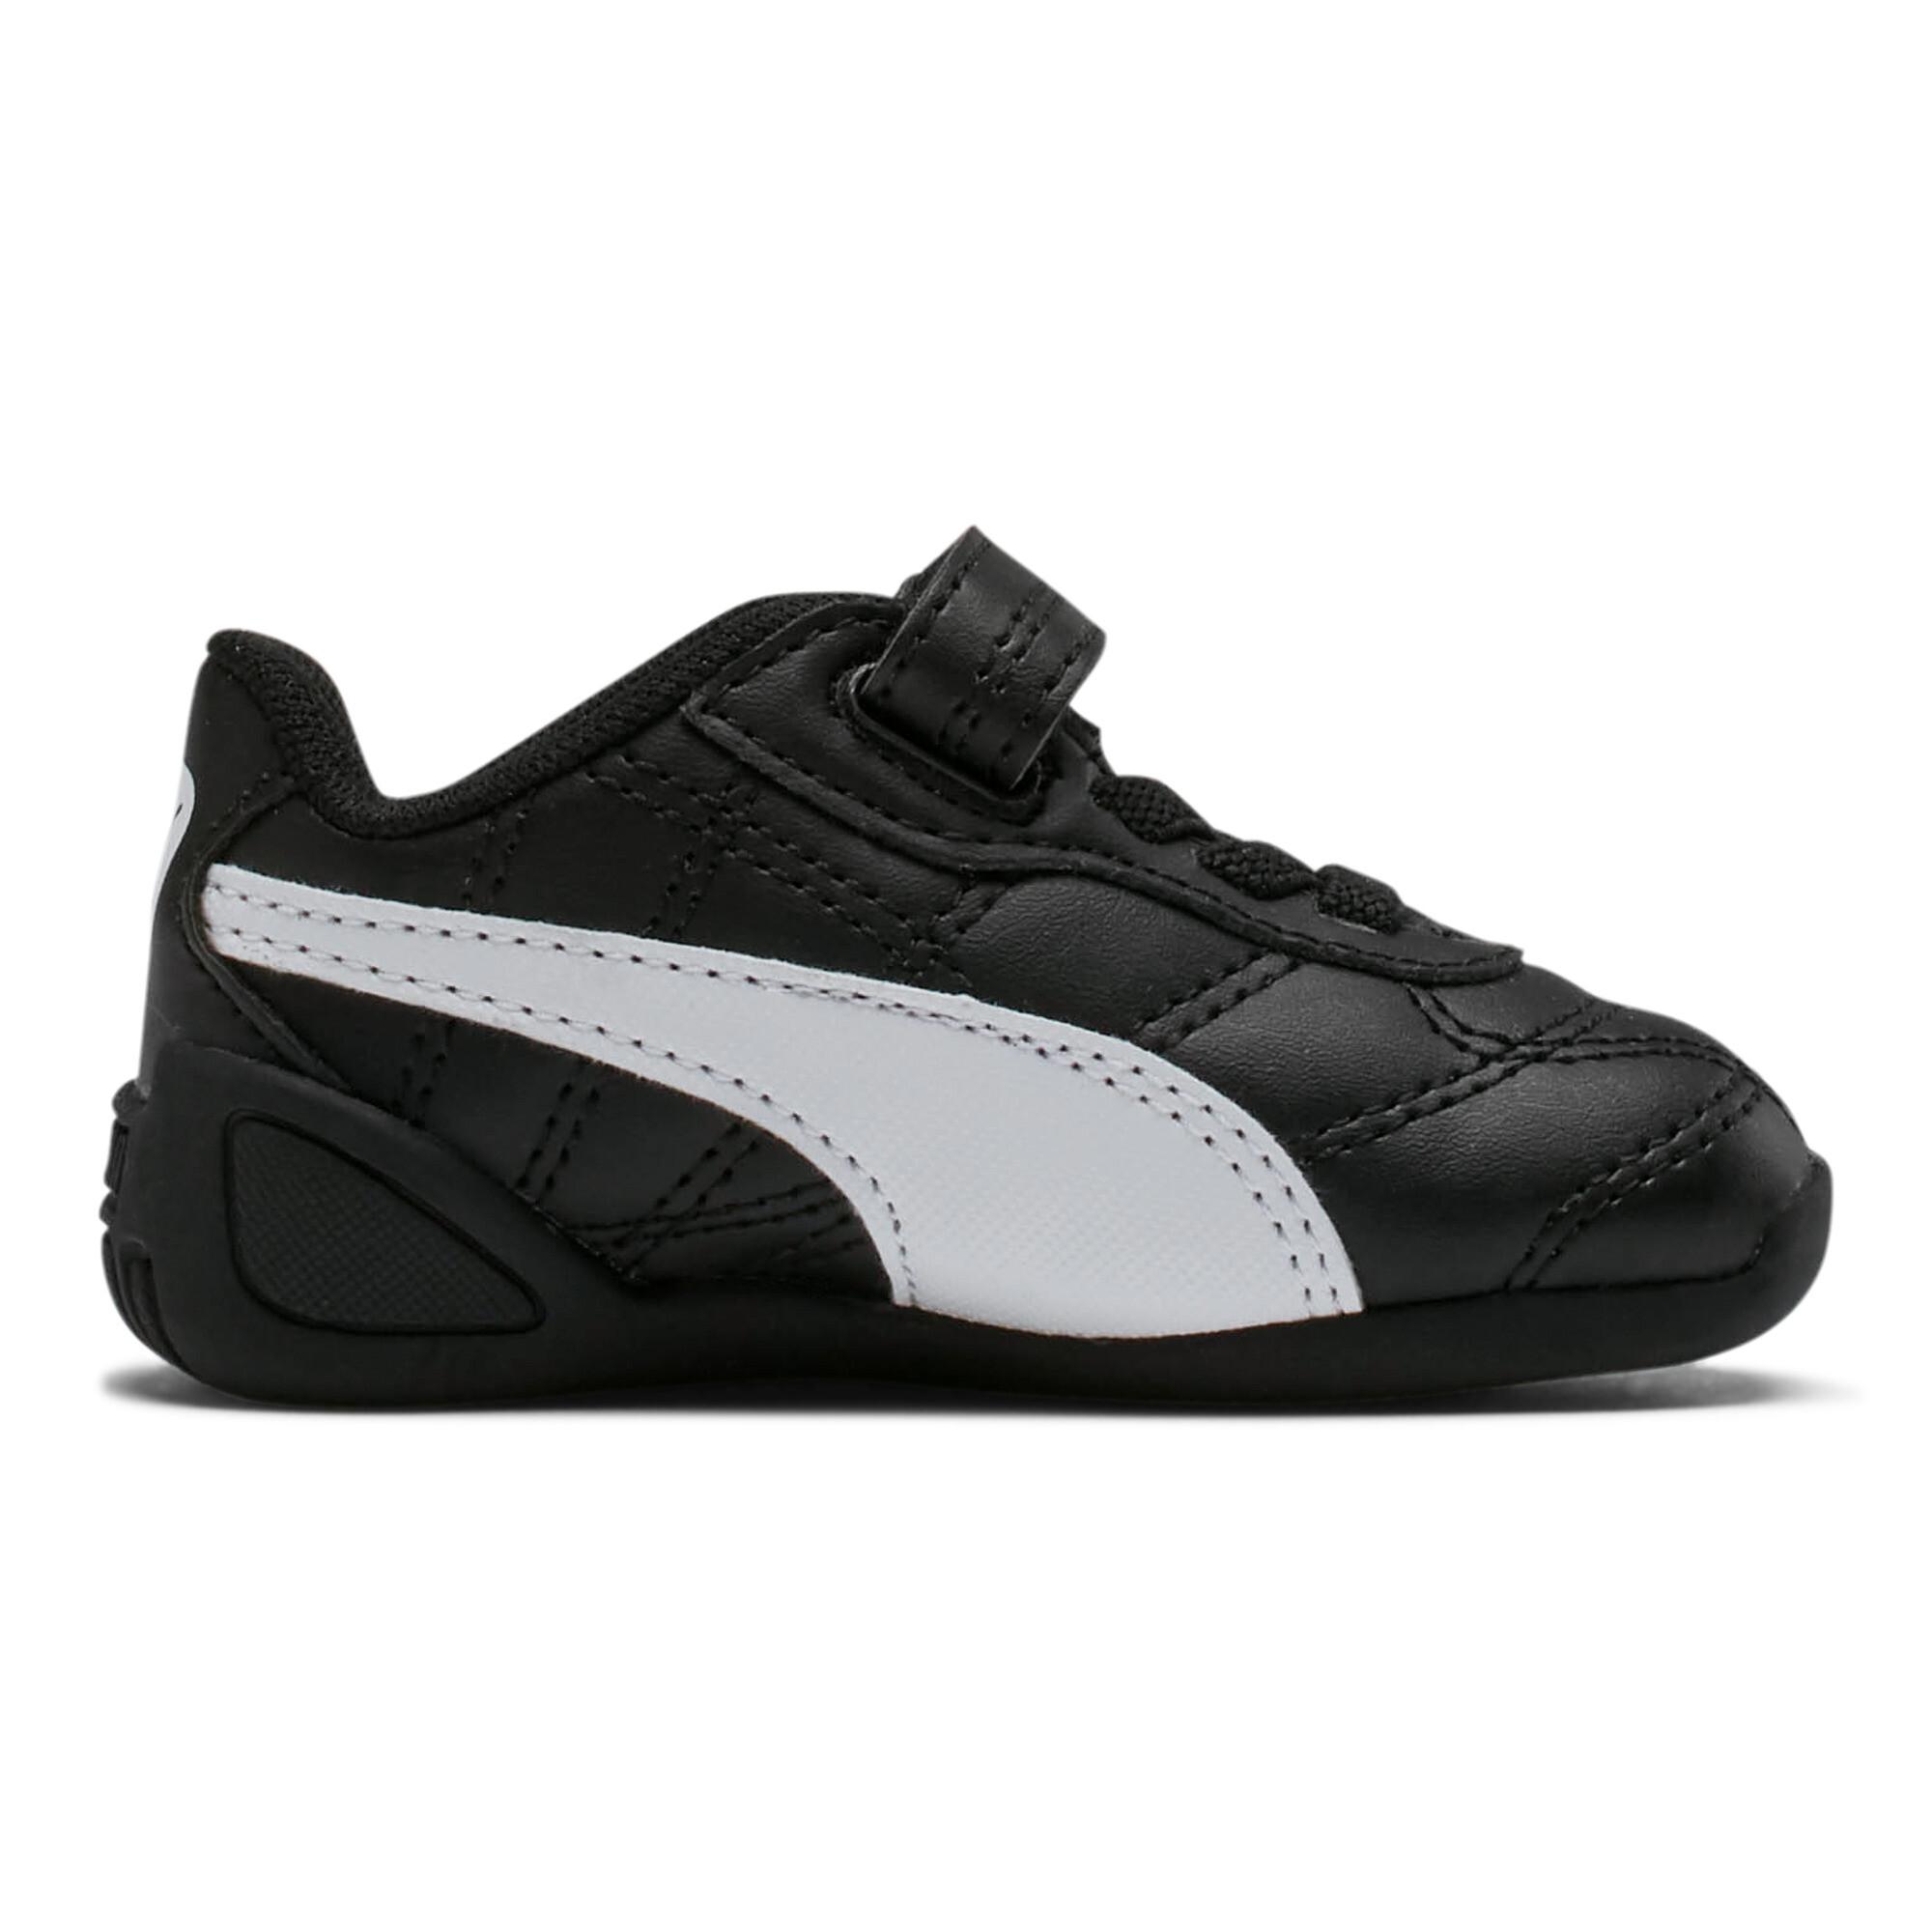 PUMA-Tune-Cat-3-AC-Toddler-Shoes-Kids-Shoe-Kids thumbnail 12